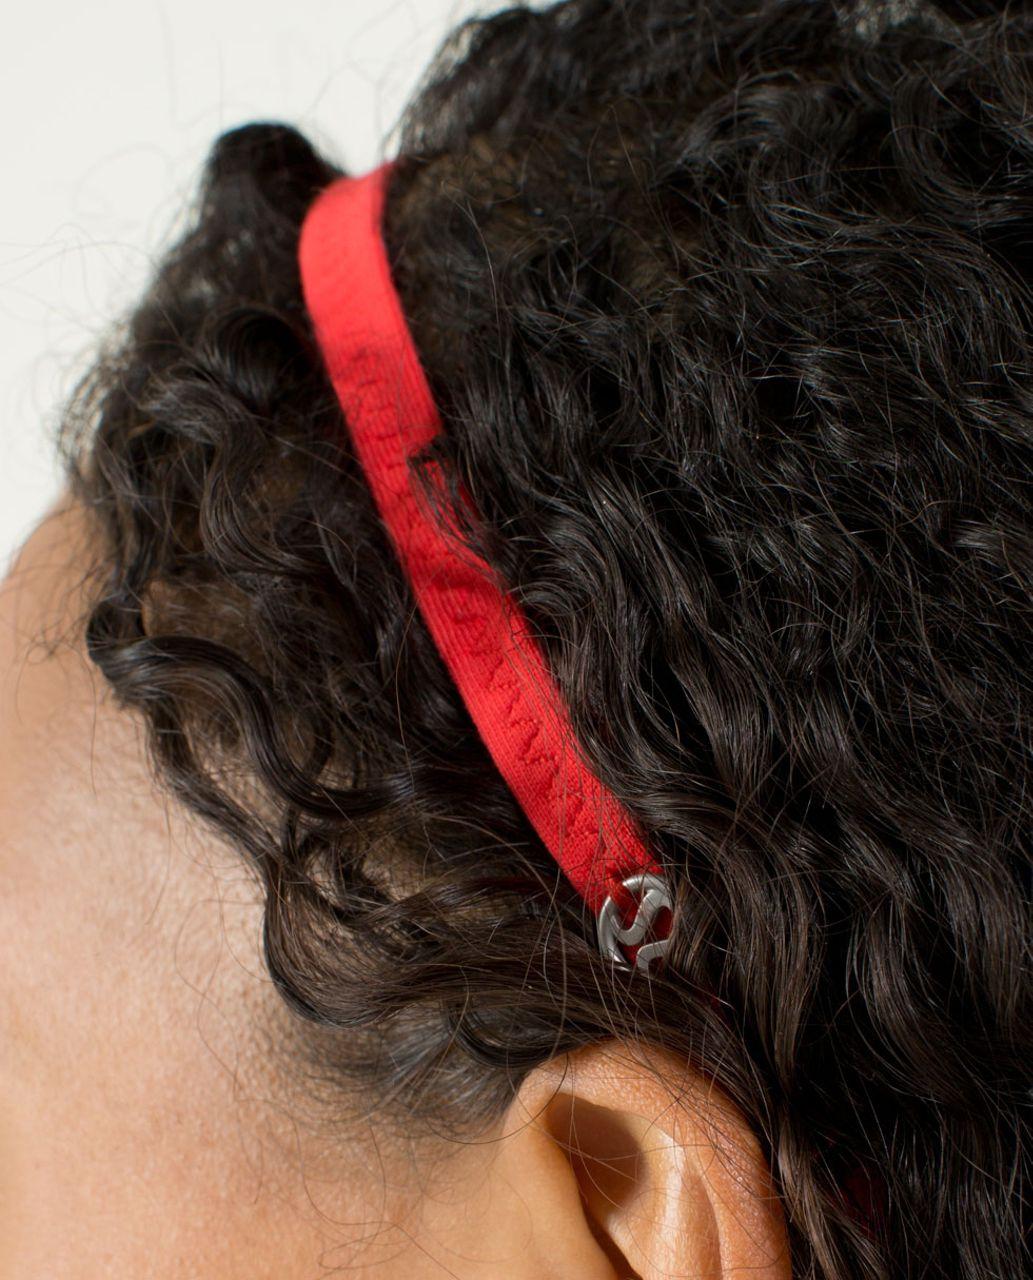 Lululemon Strappy Headband - Love Red